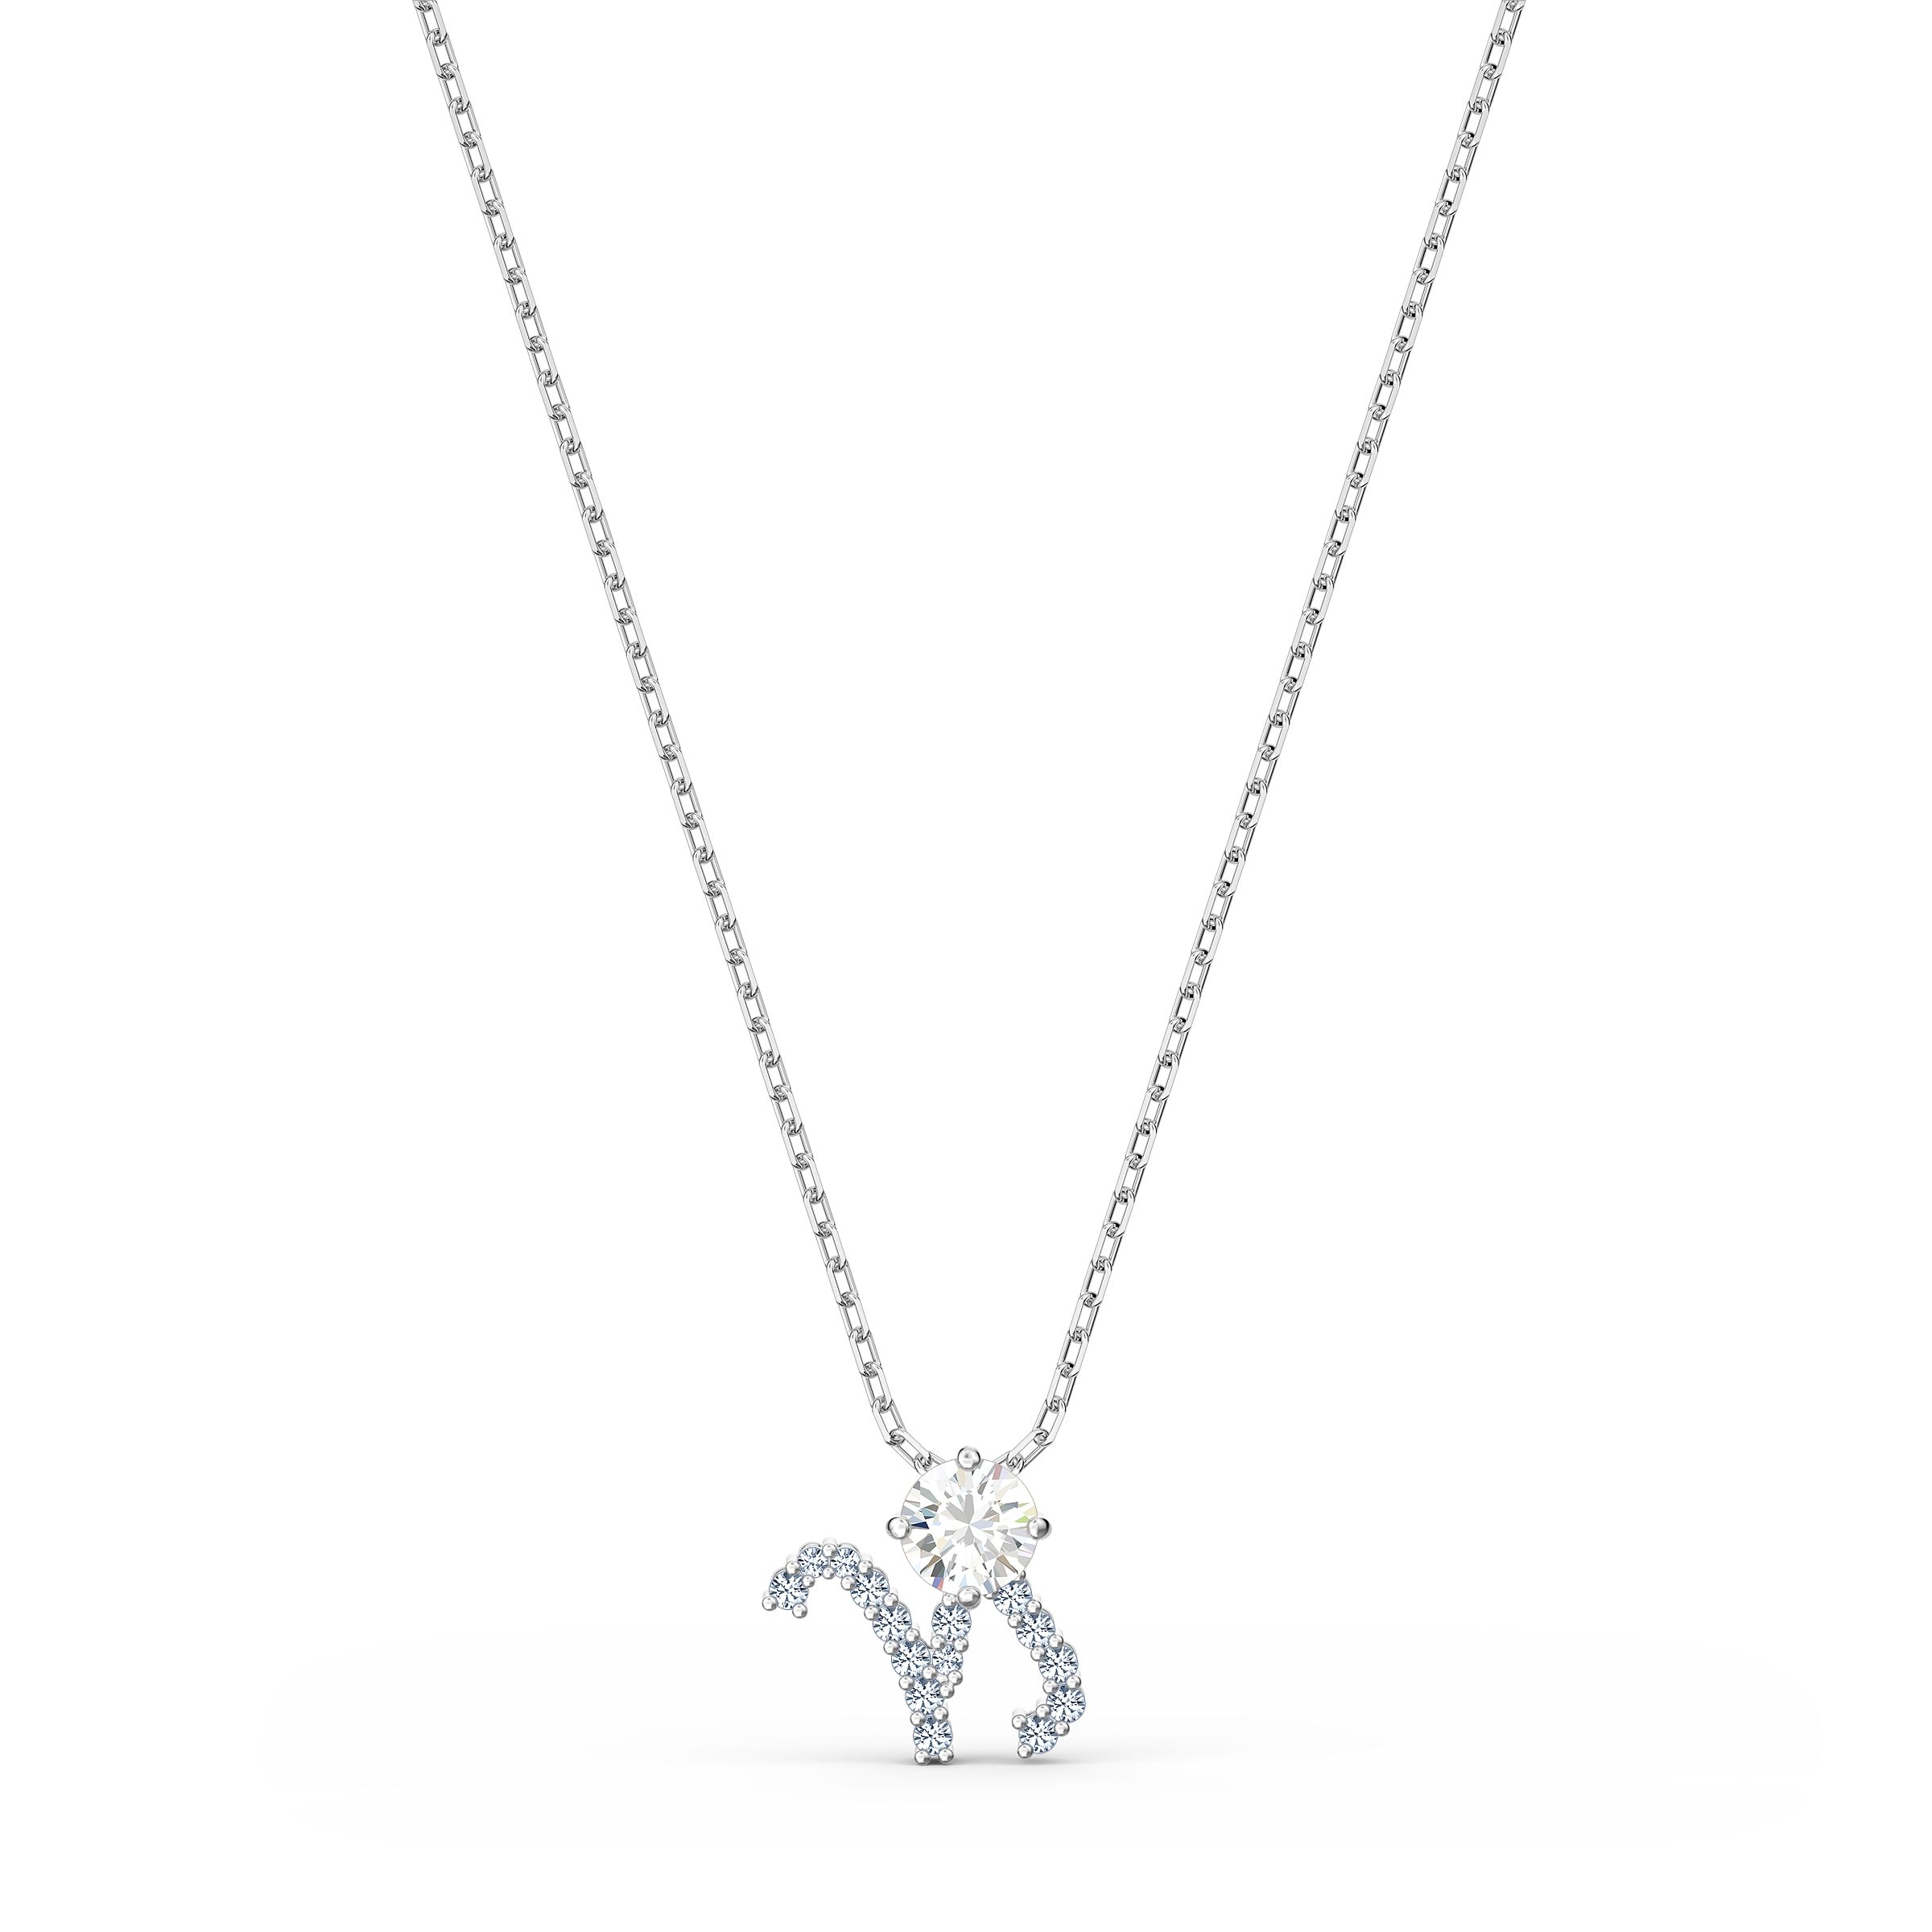 Pendentif Zodiac II, Capricorne, blanc, finition mix de métal, Swarovski